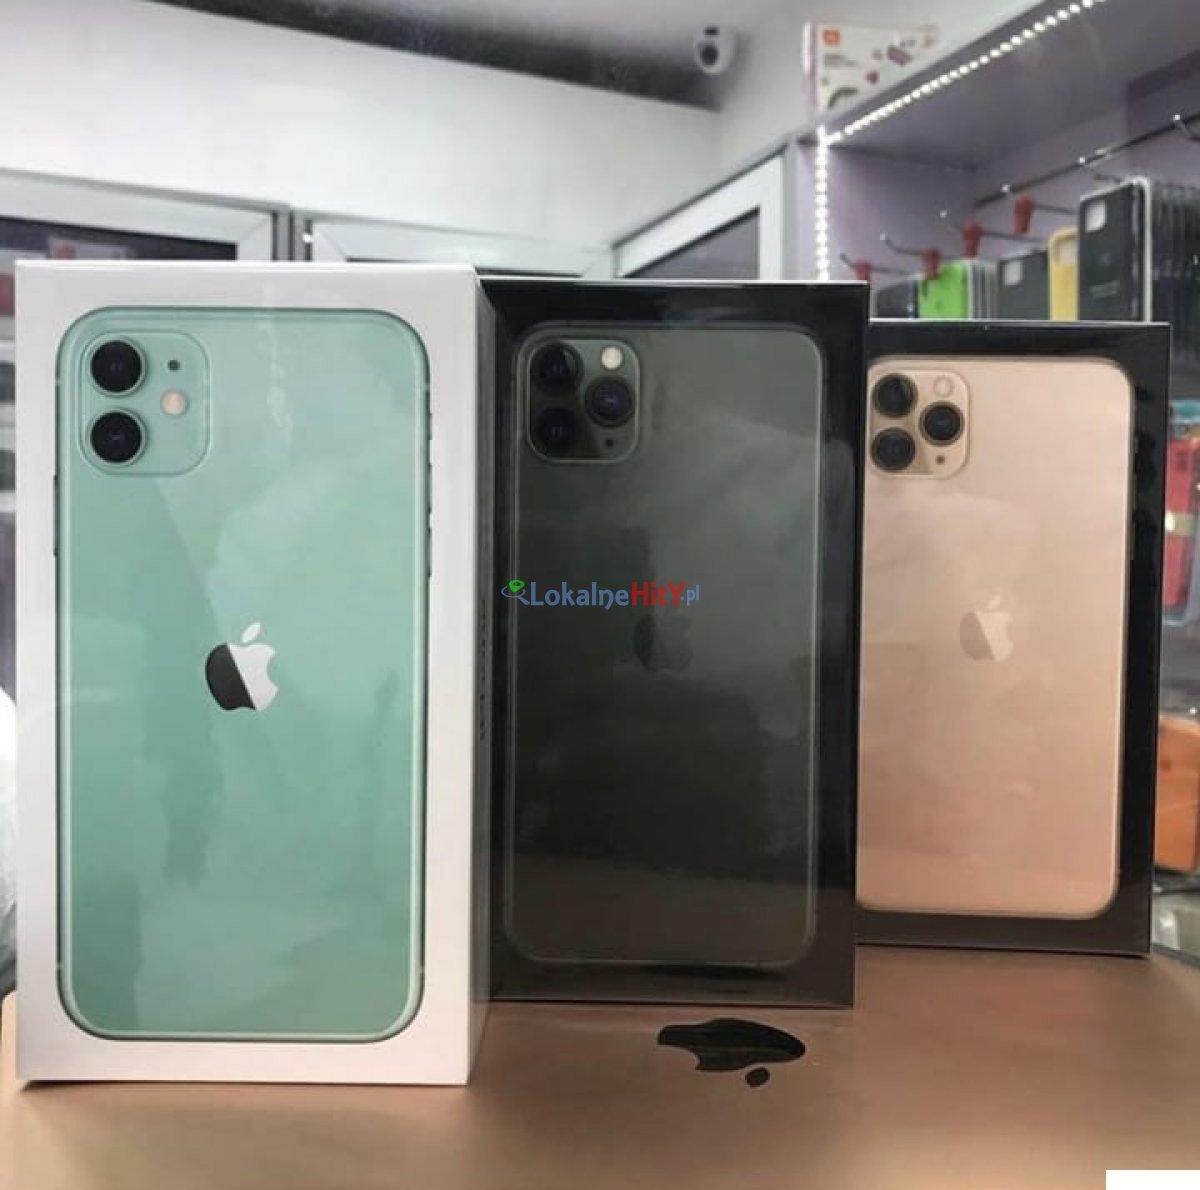 Apple iPhone 11 Pro Max,11 Pro,11 €350 EUR Whatsapp +447841621748 Samsung S20 Ultra 5G